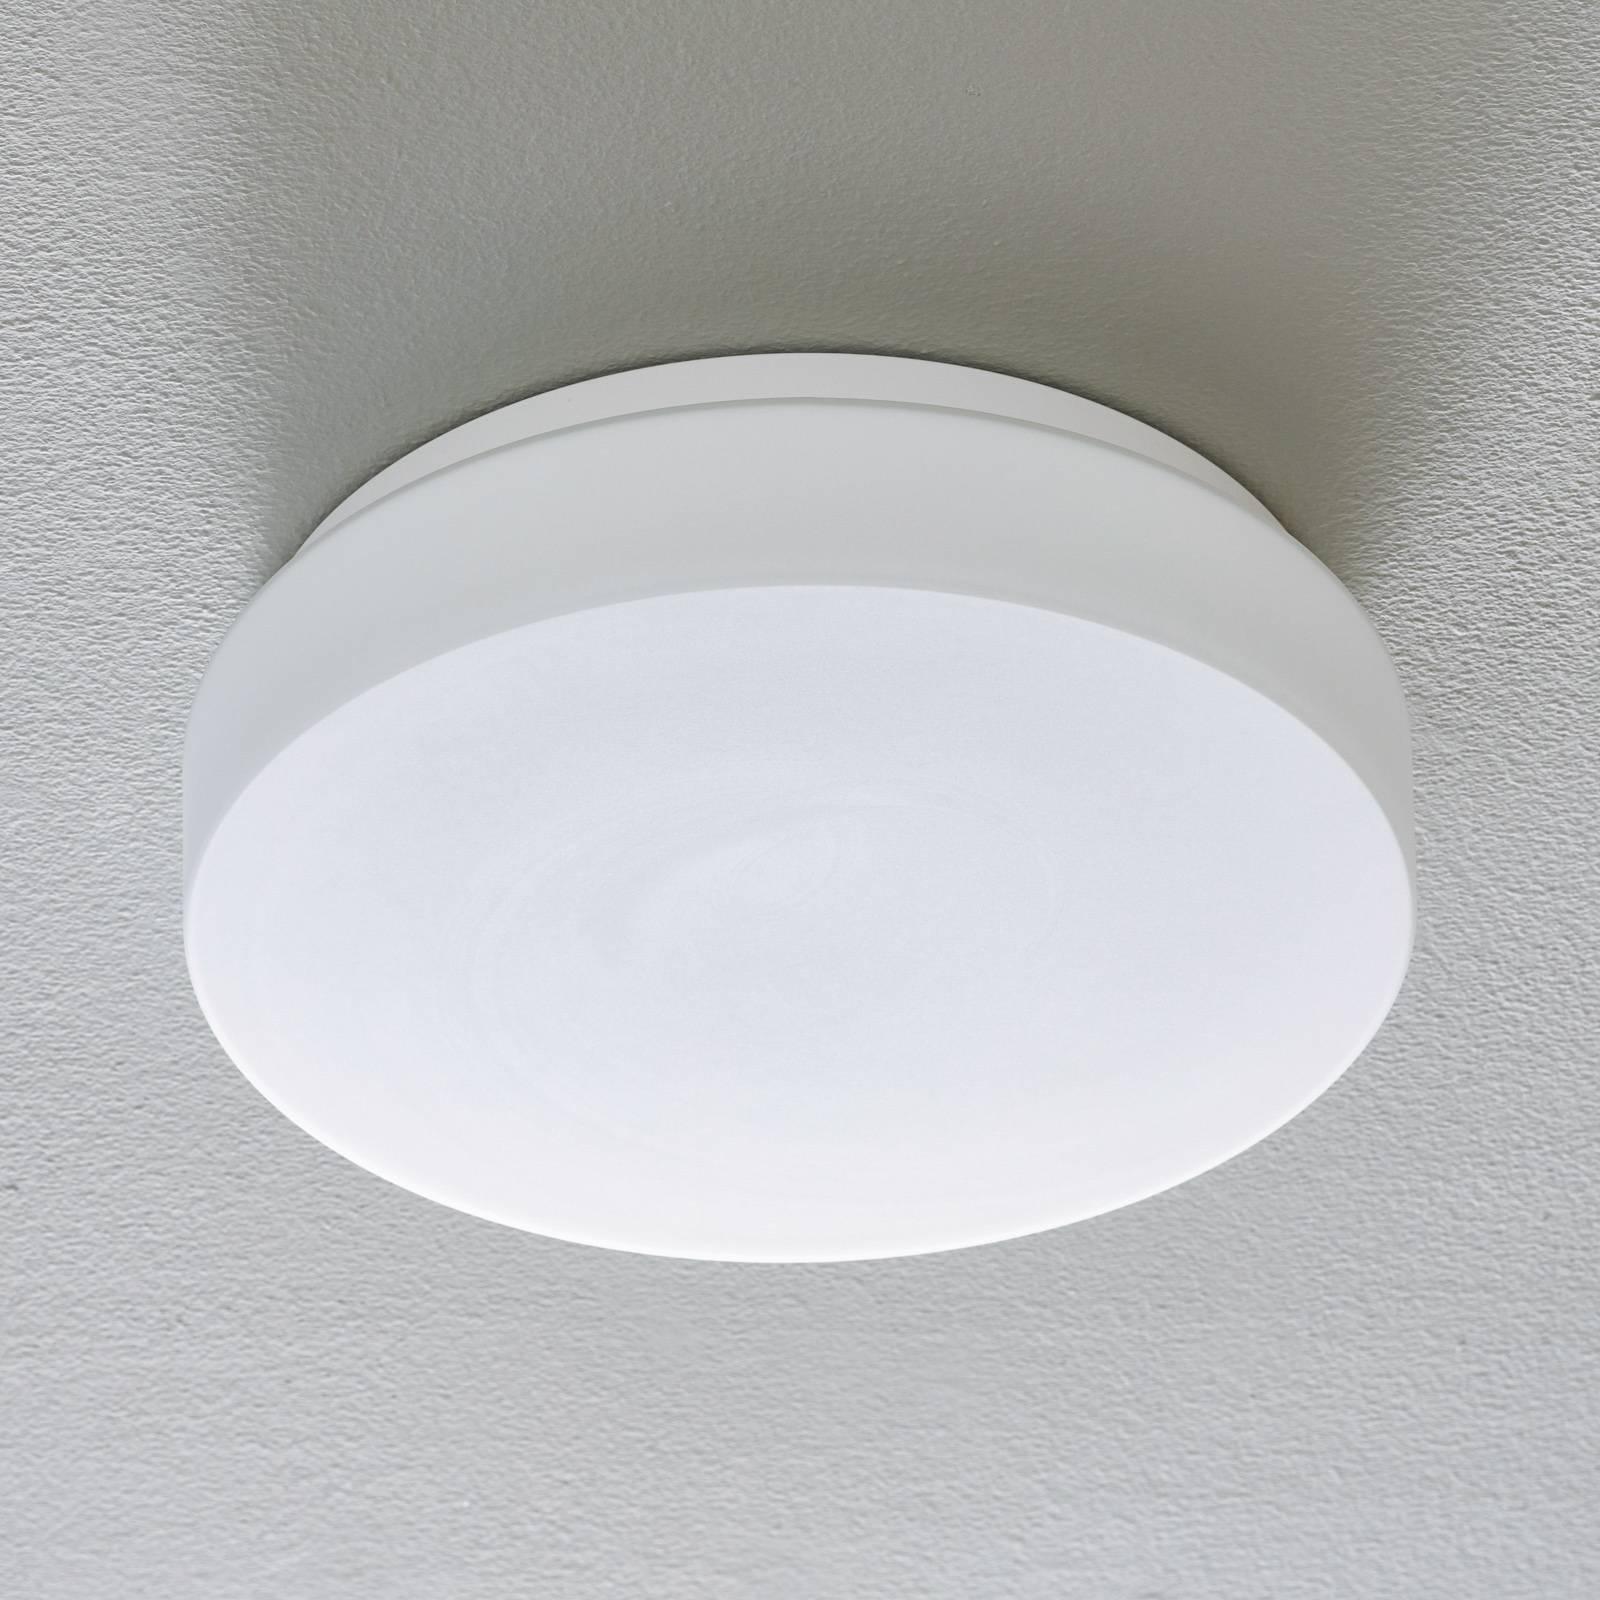 BEGA 50079 LED-kattovalaisin DALI 3 000K Ø34cm